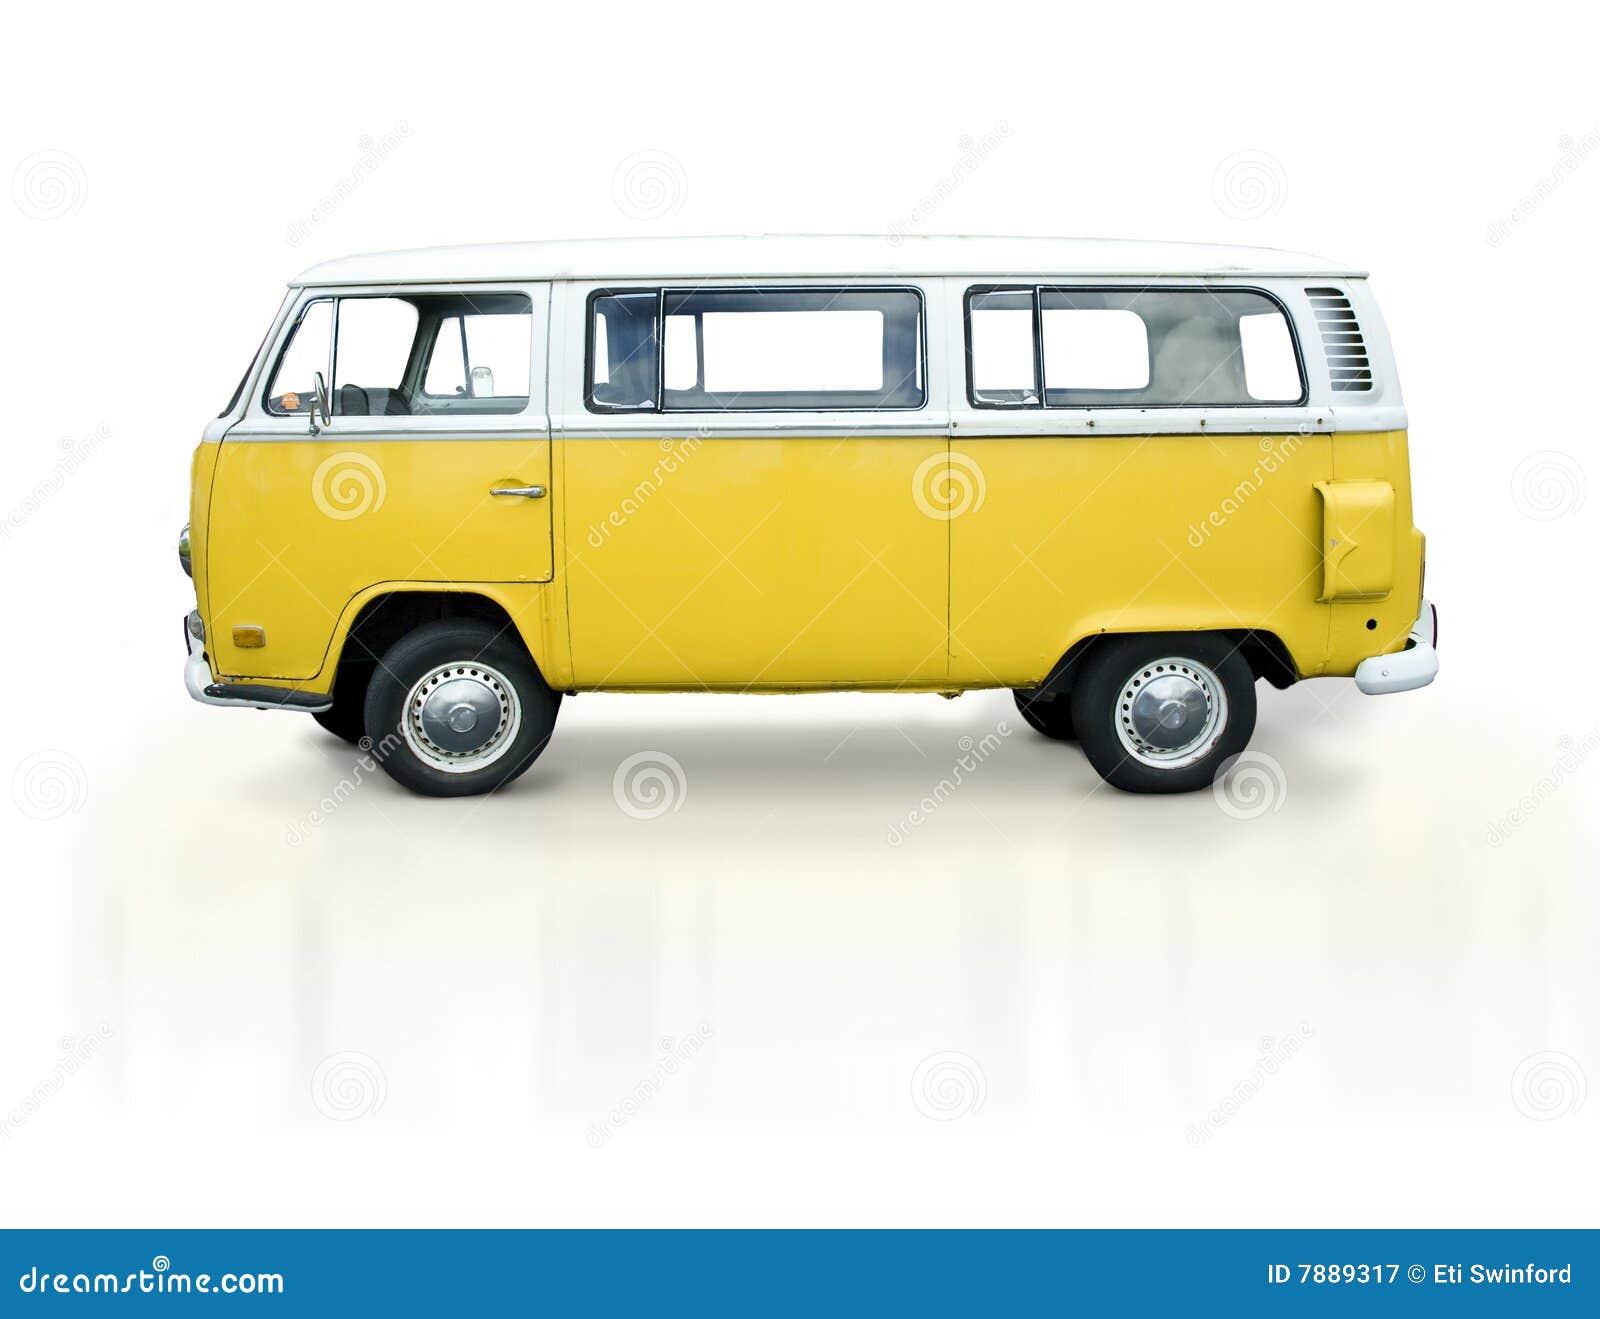 Uitstekende gele bestelwagen